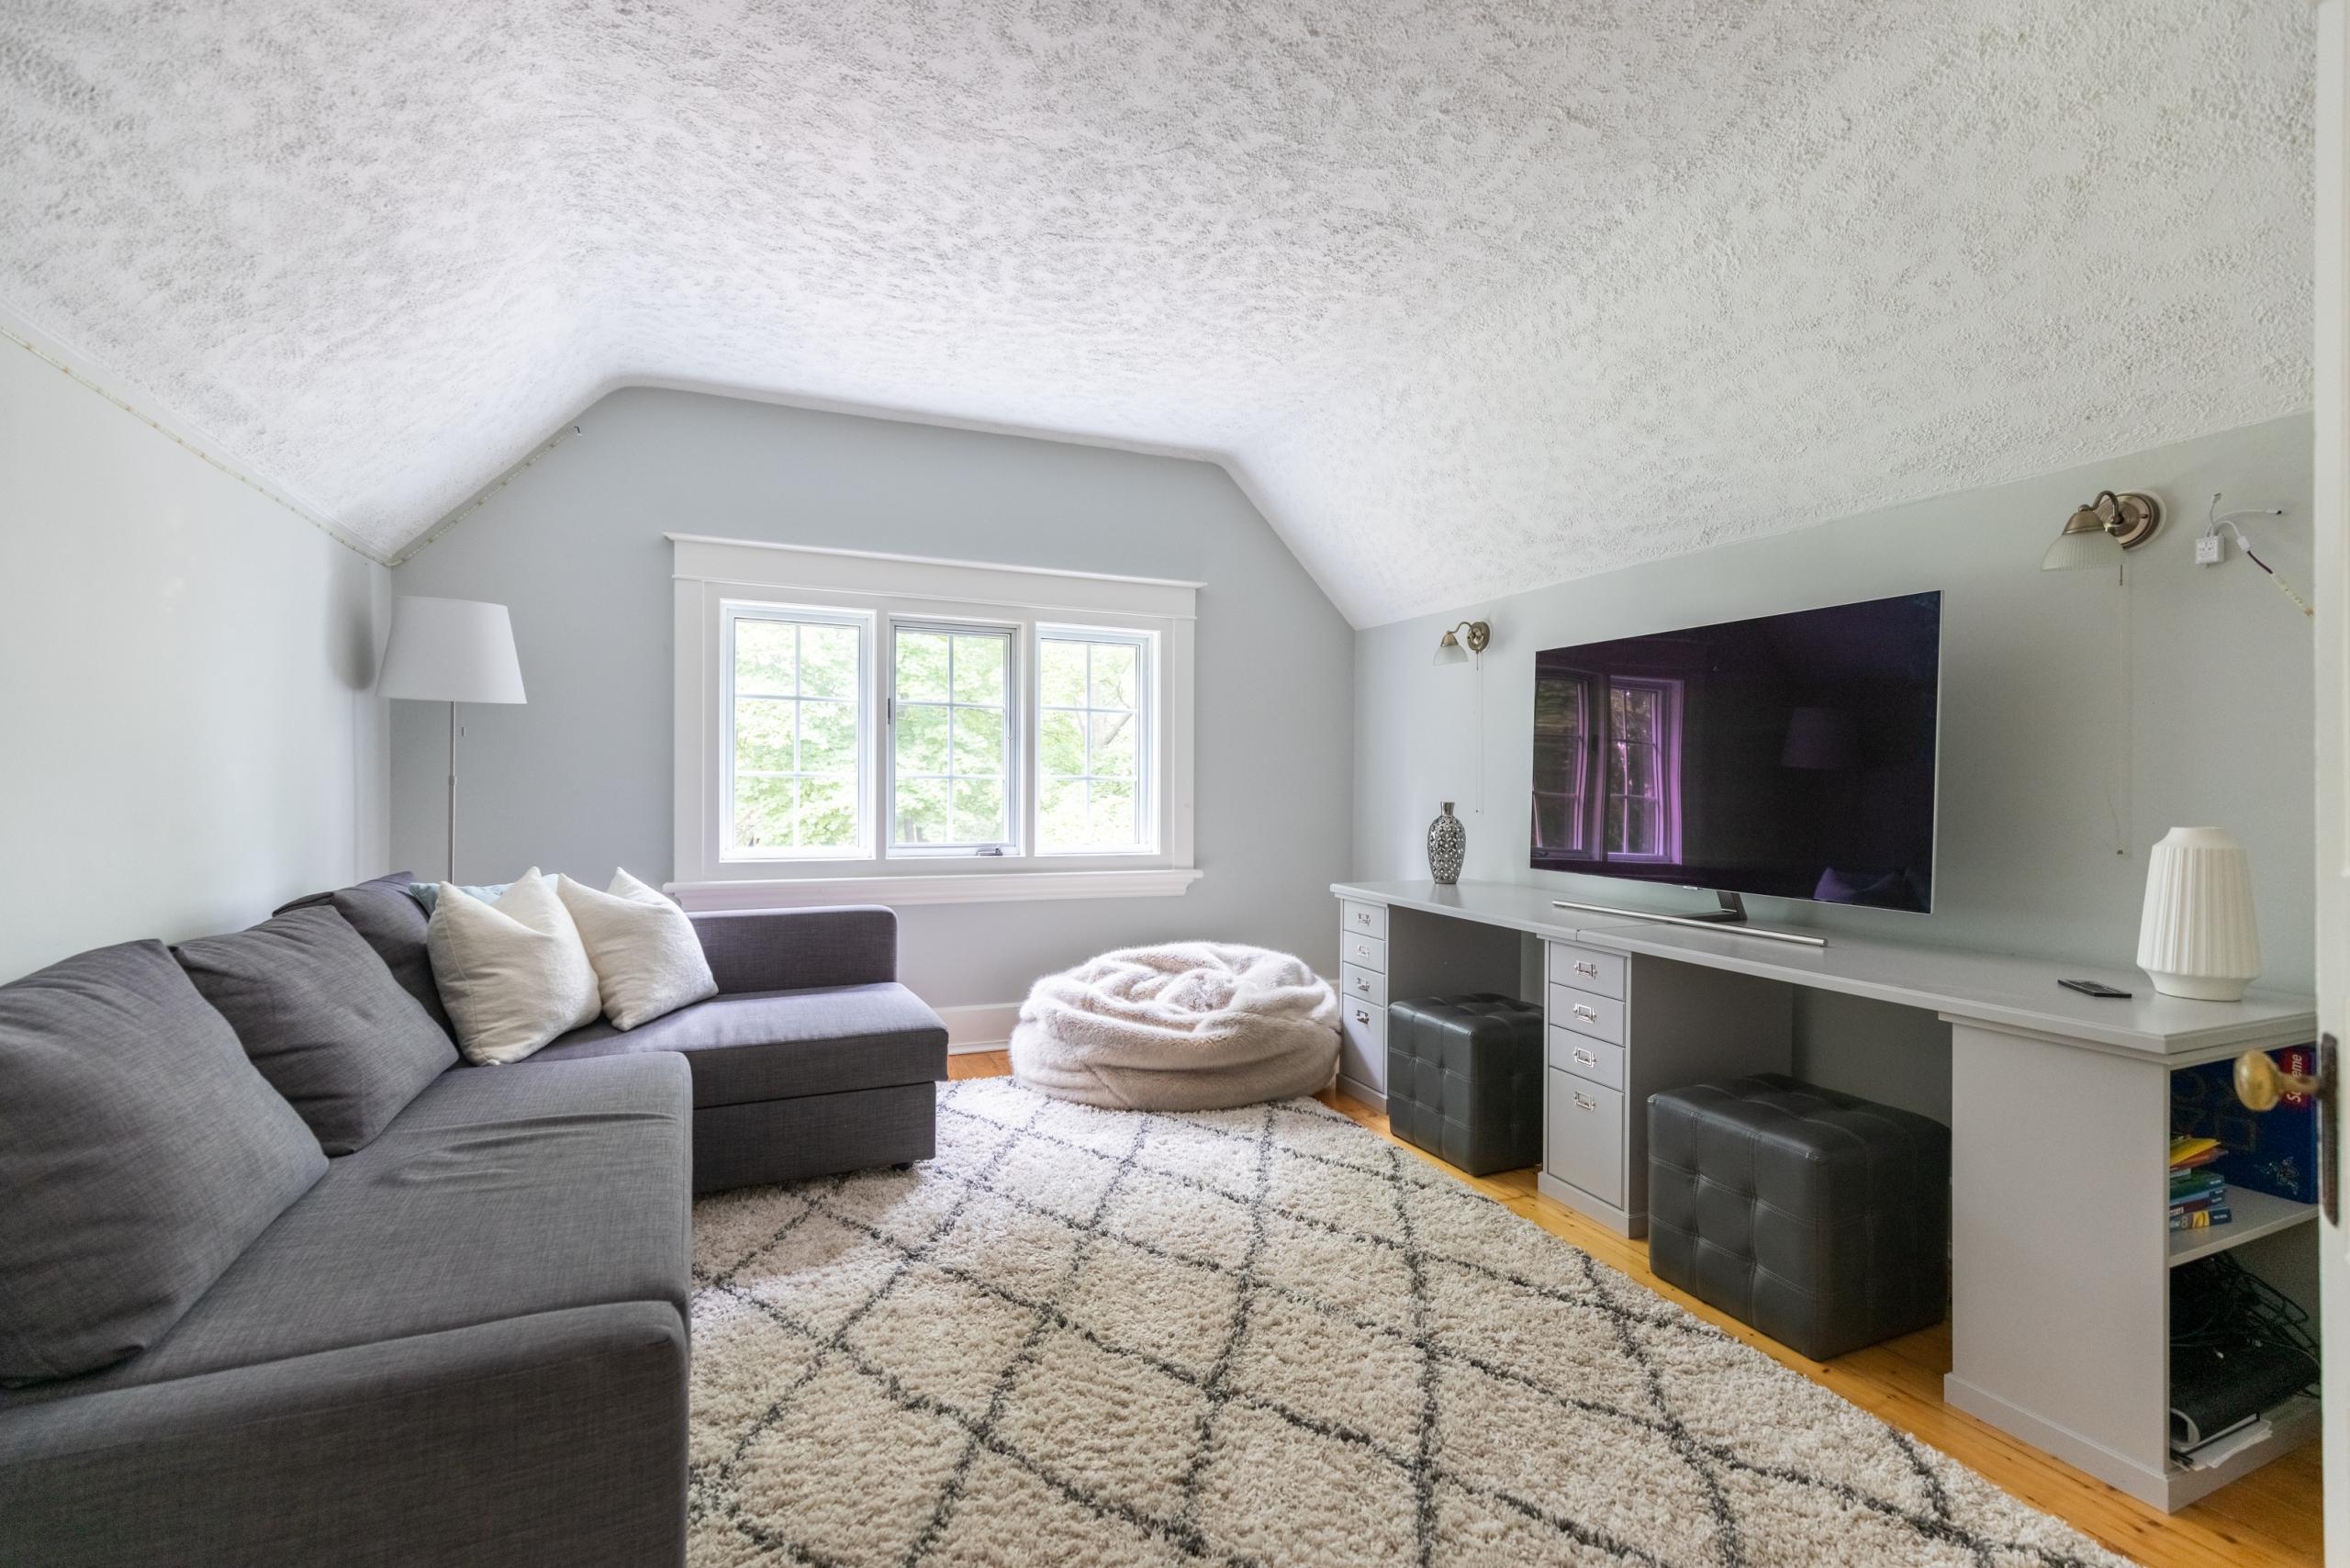 Living room featured at 573 Lakeshore Road West, Oakville, ON at Alex Irish & Associates